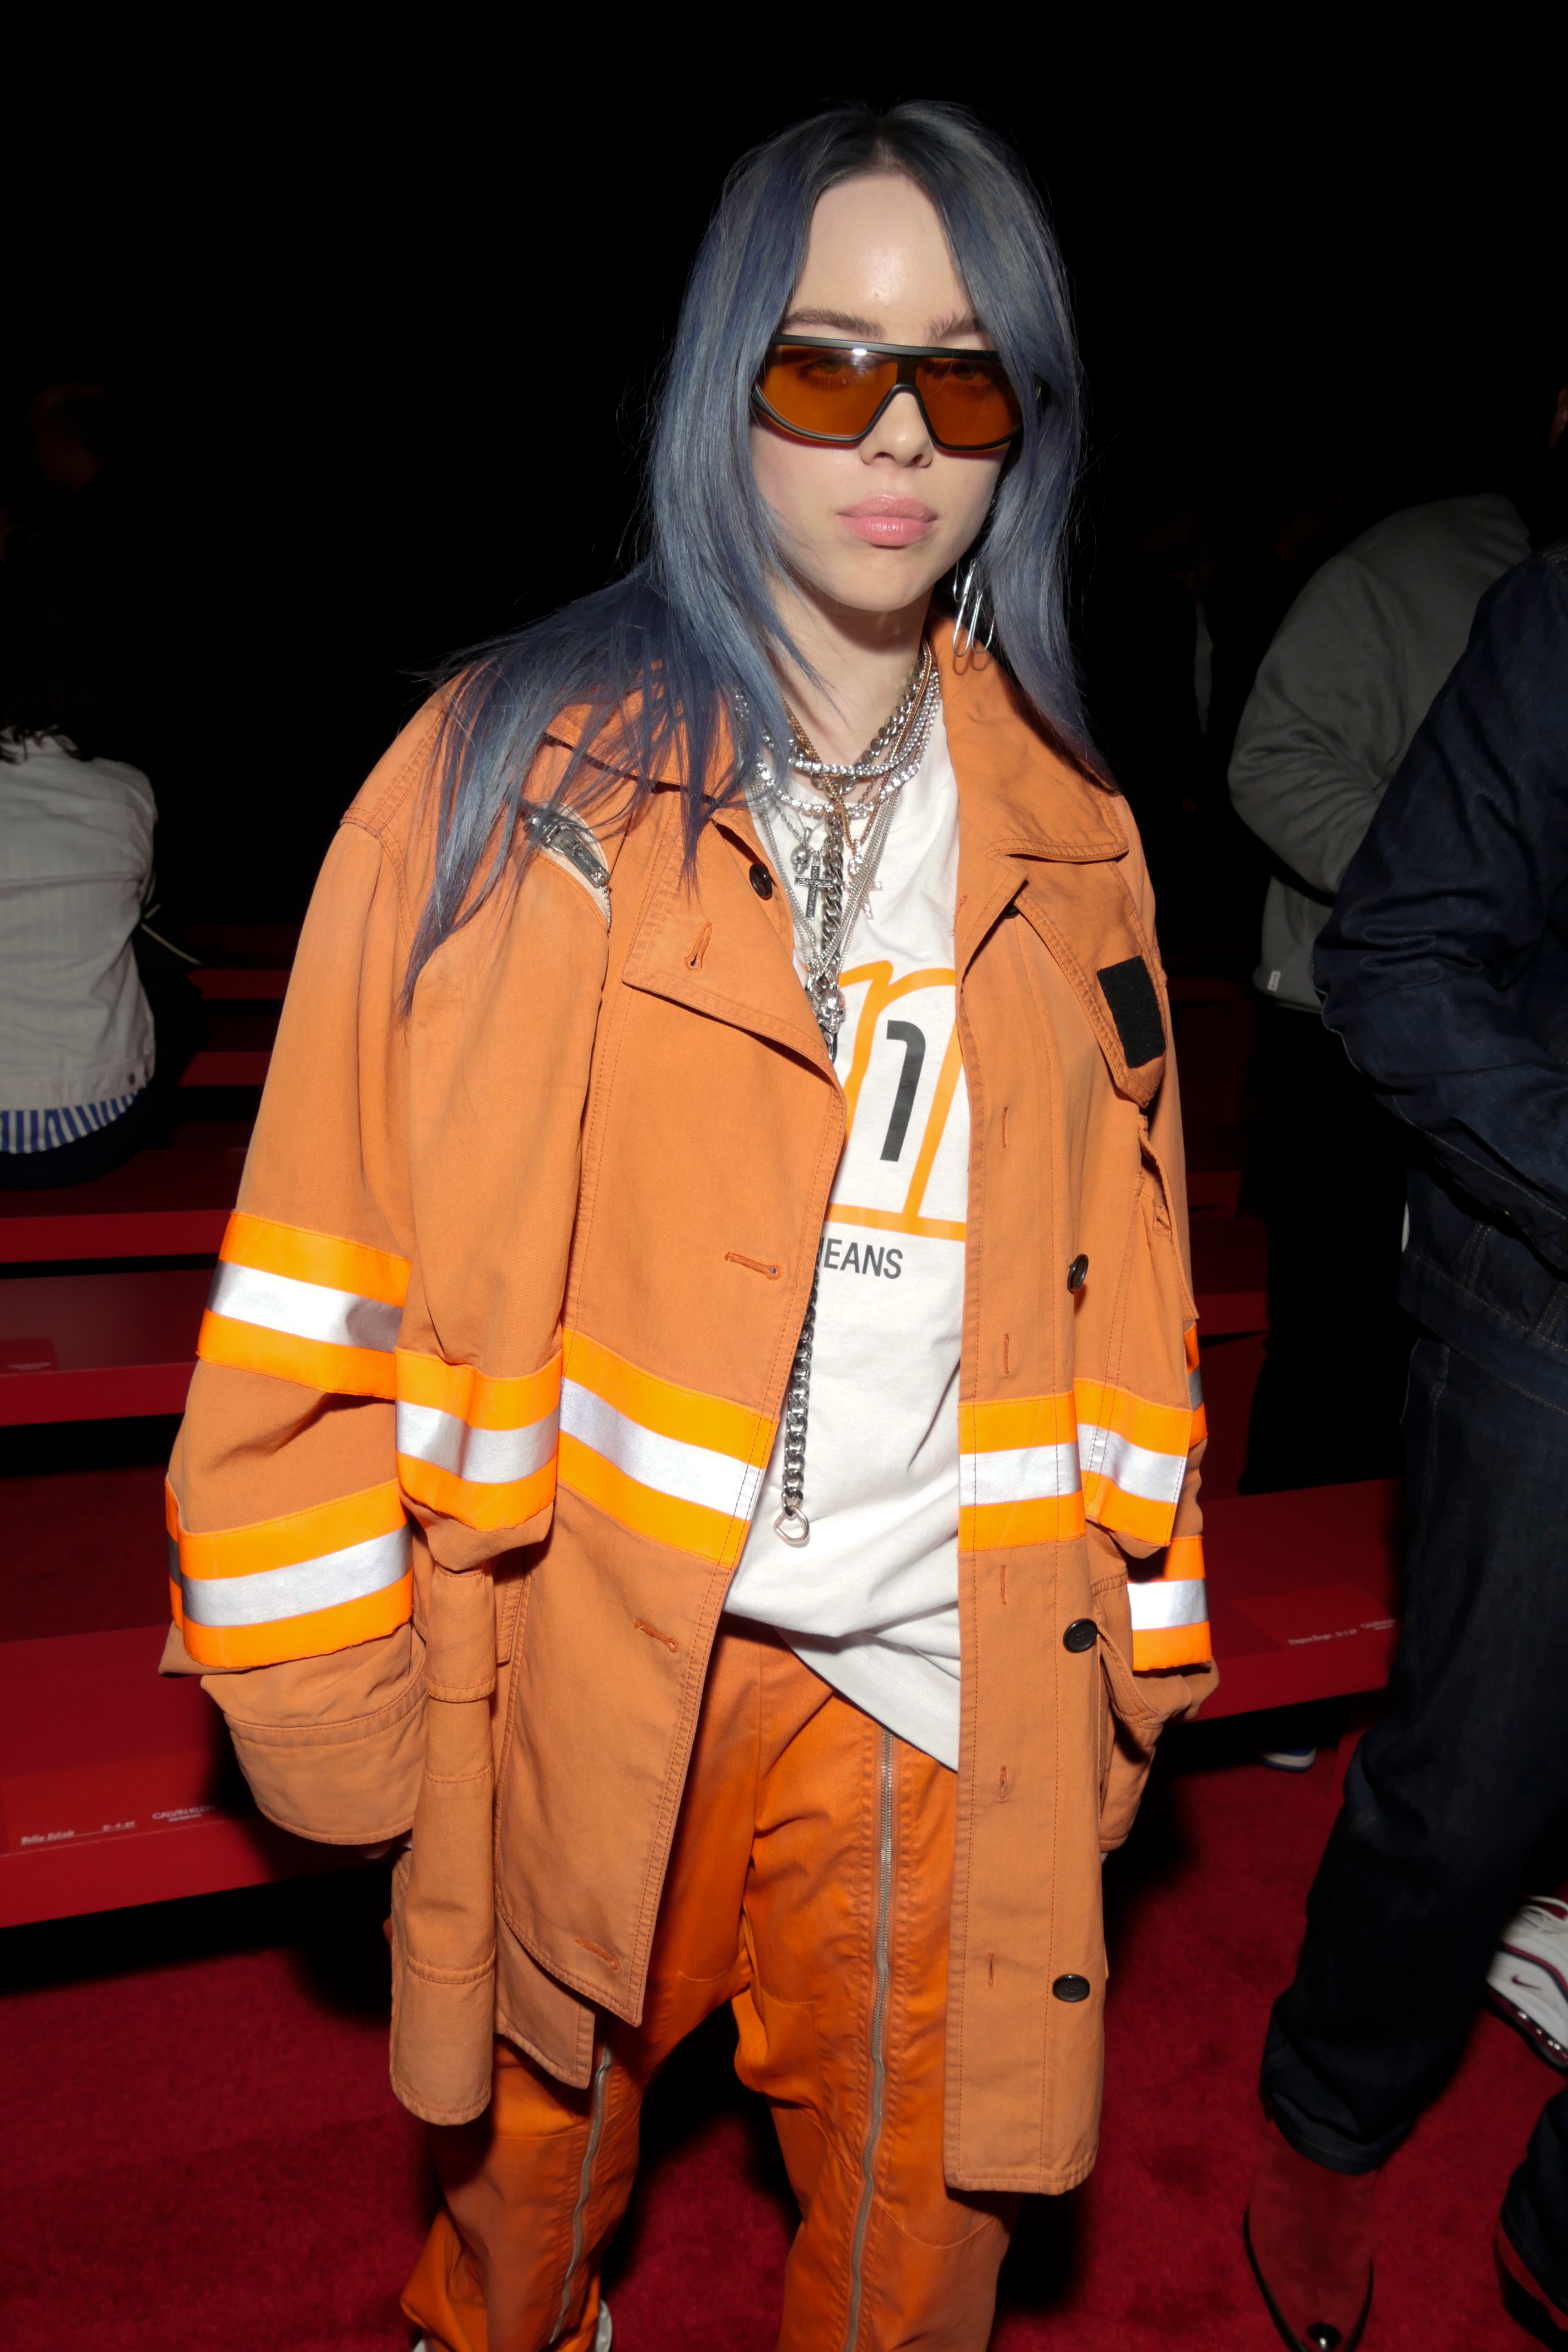 Billie Eilish in the front rowCalvin Klein show, Front Row, Spring Summer 2019, New York Fashion Week, USA - 11 Sep 2018